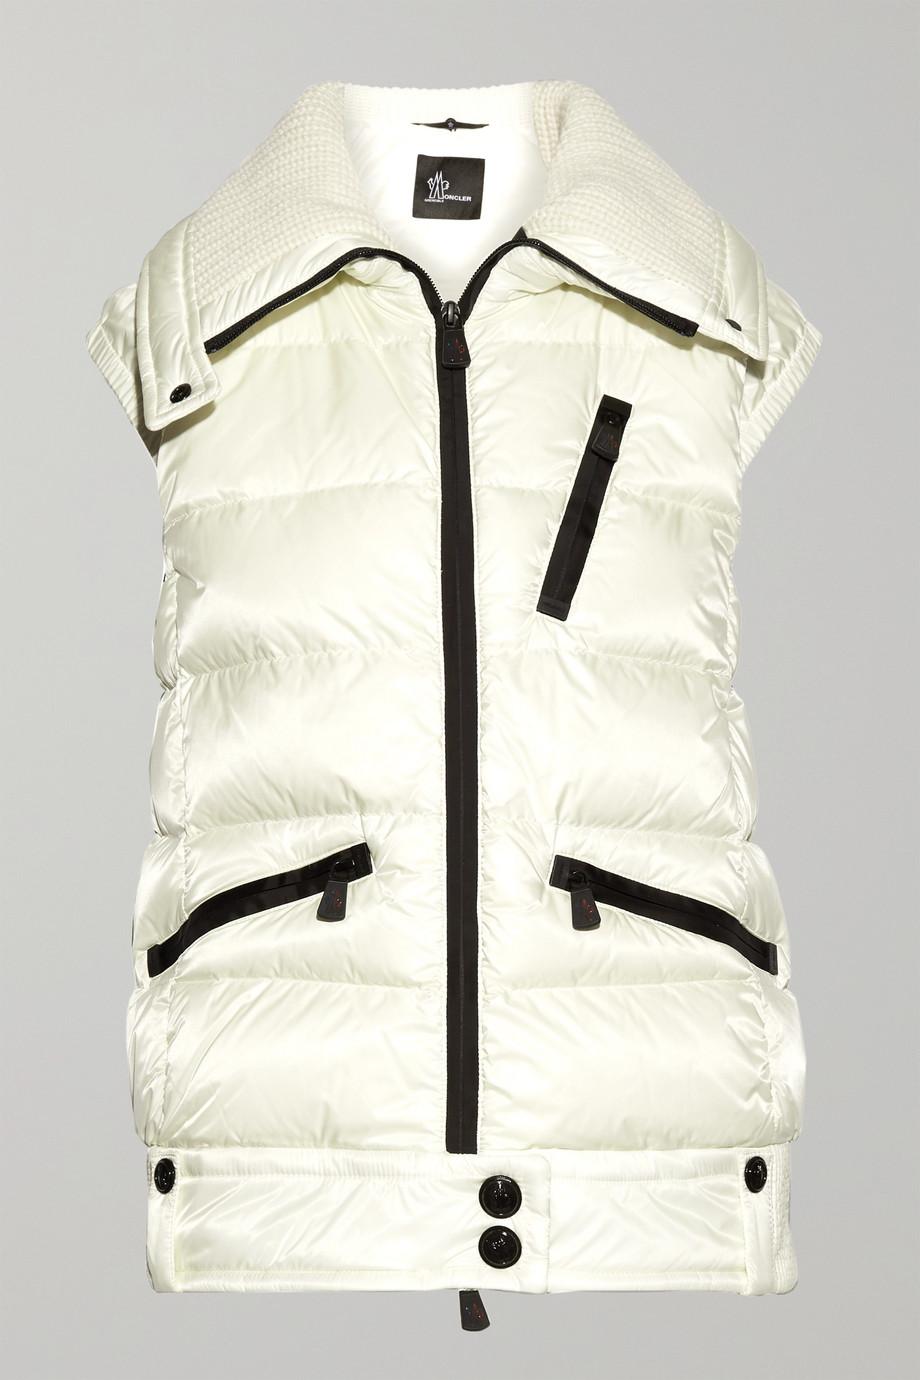 Moncler Grenoble Les Bains quilted down vest